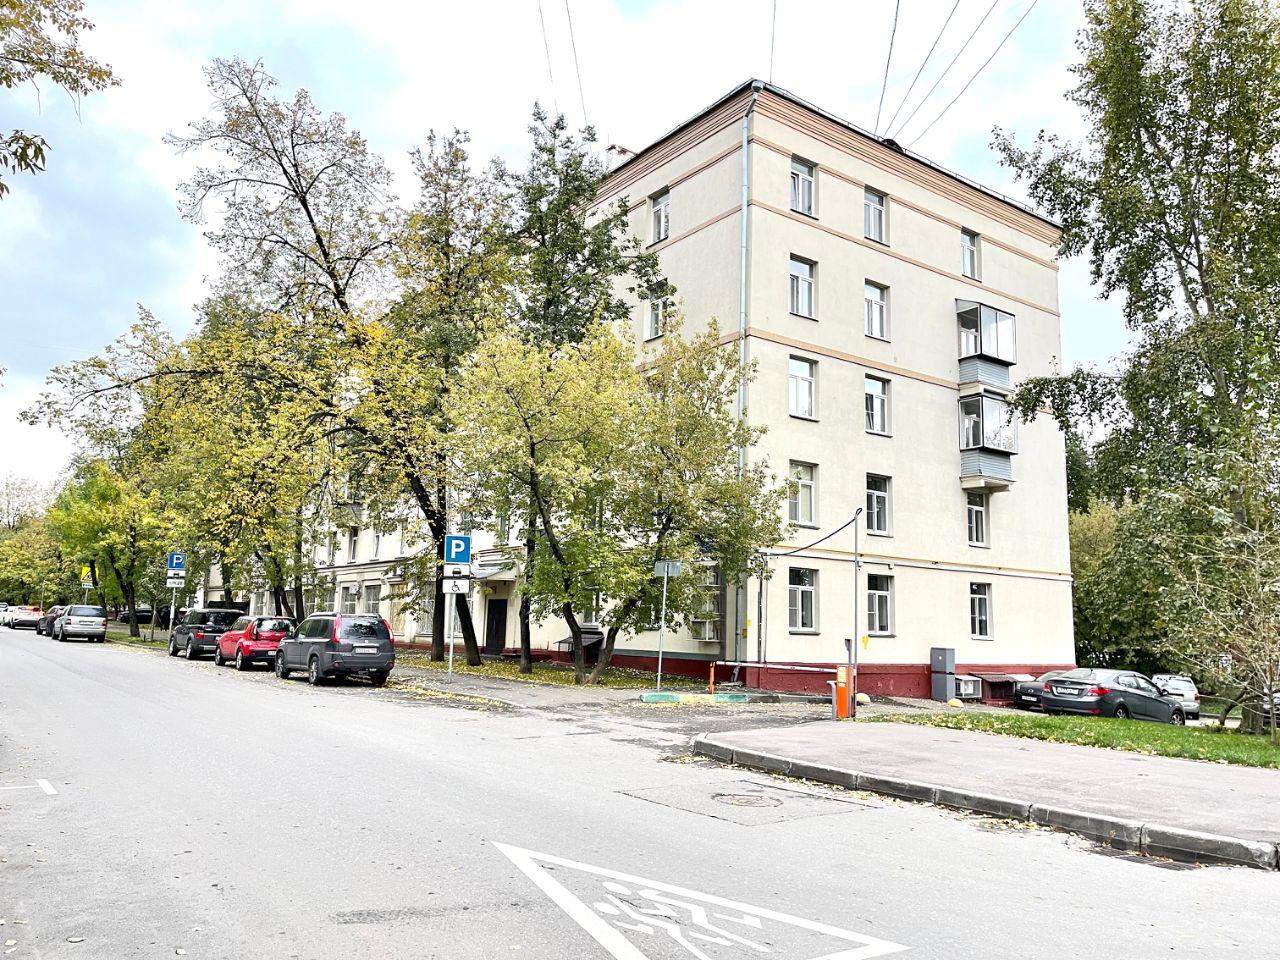 Продажа комнаты улица Долгова 5 Москва СЗАО